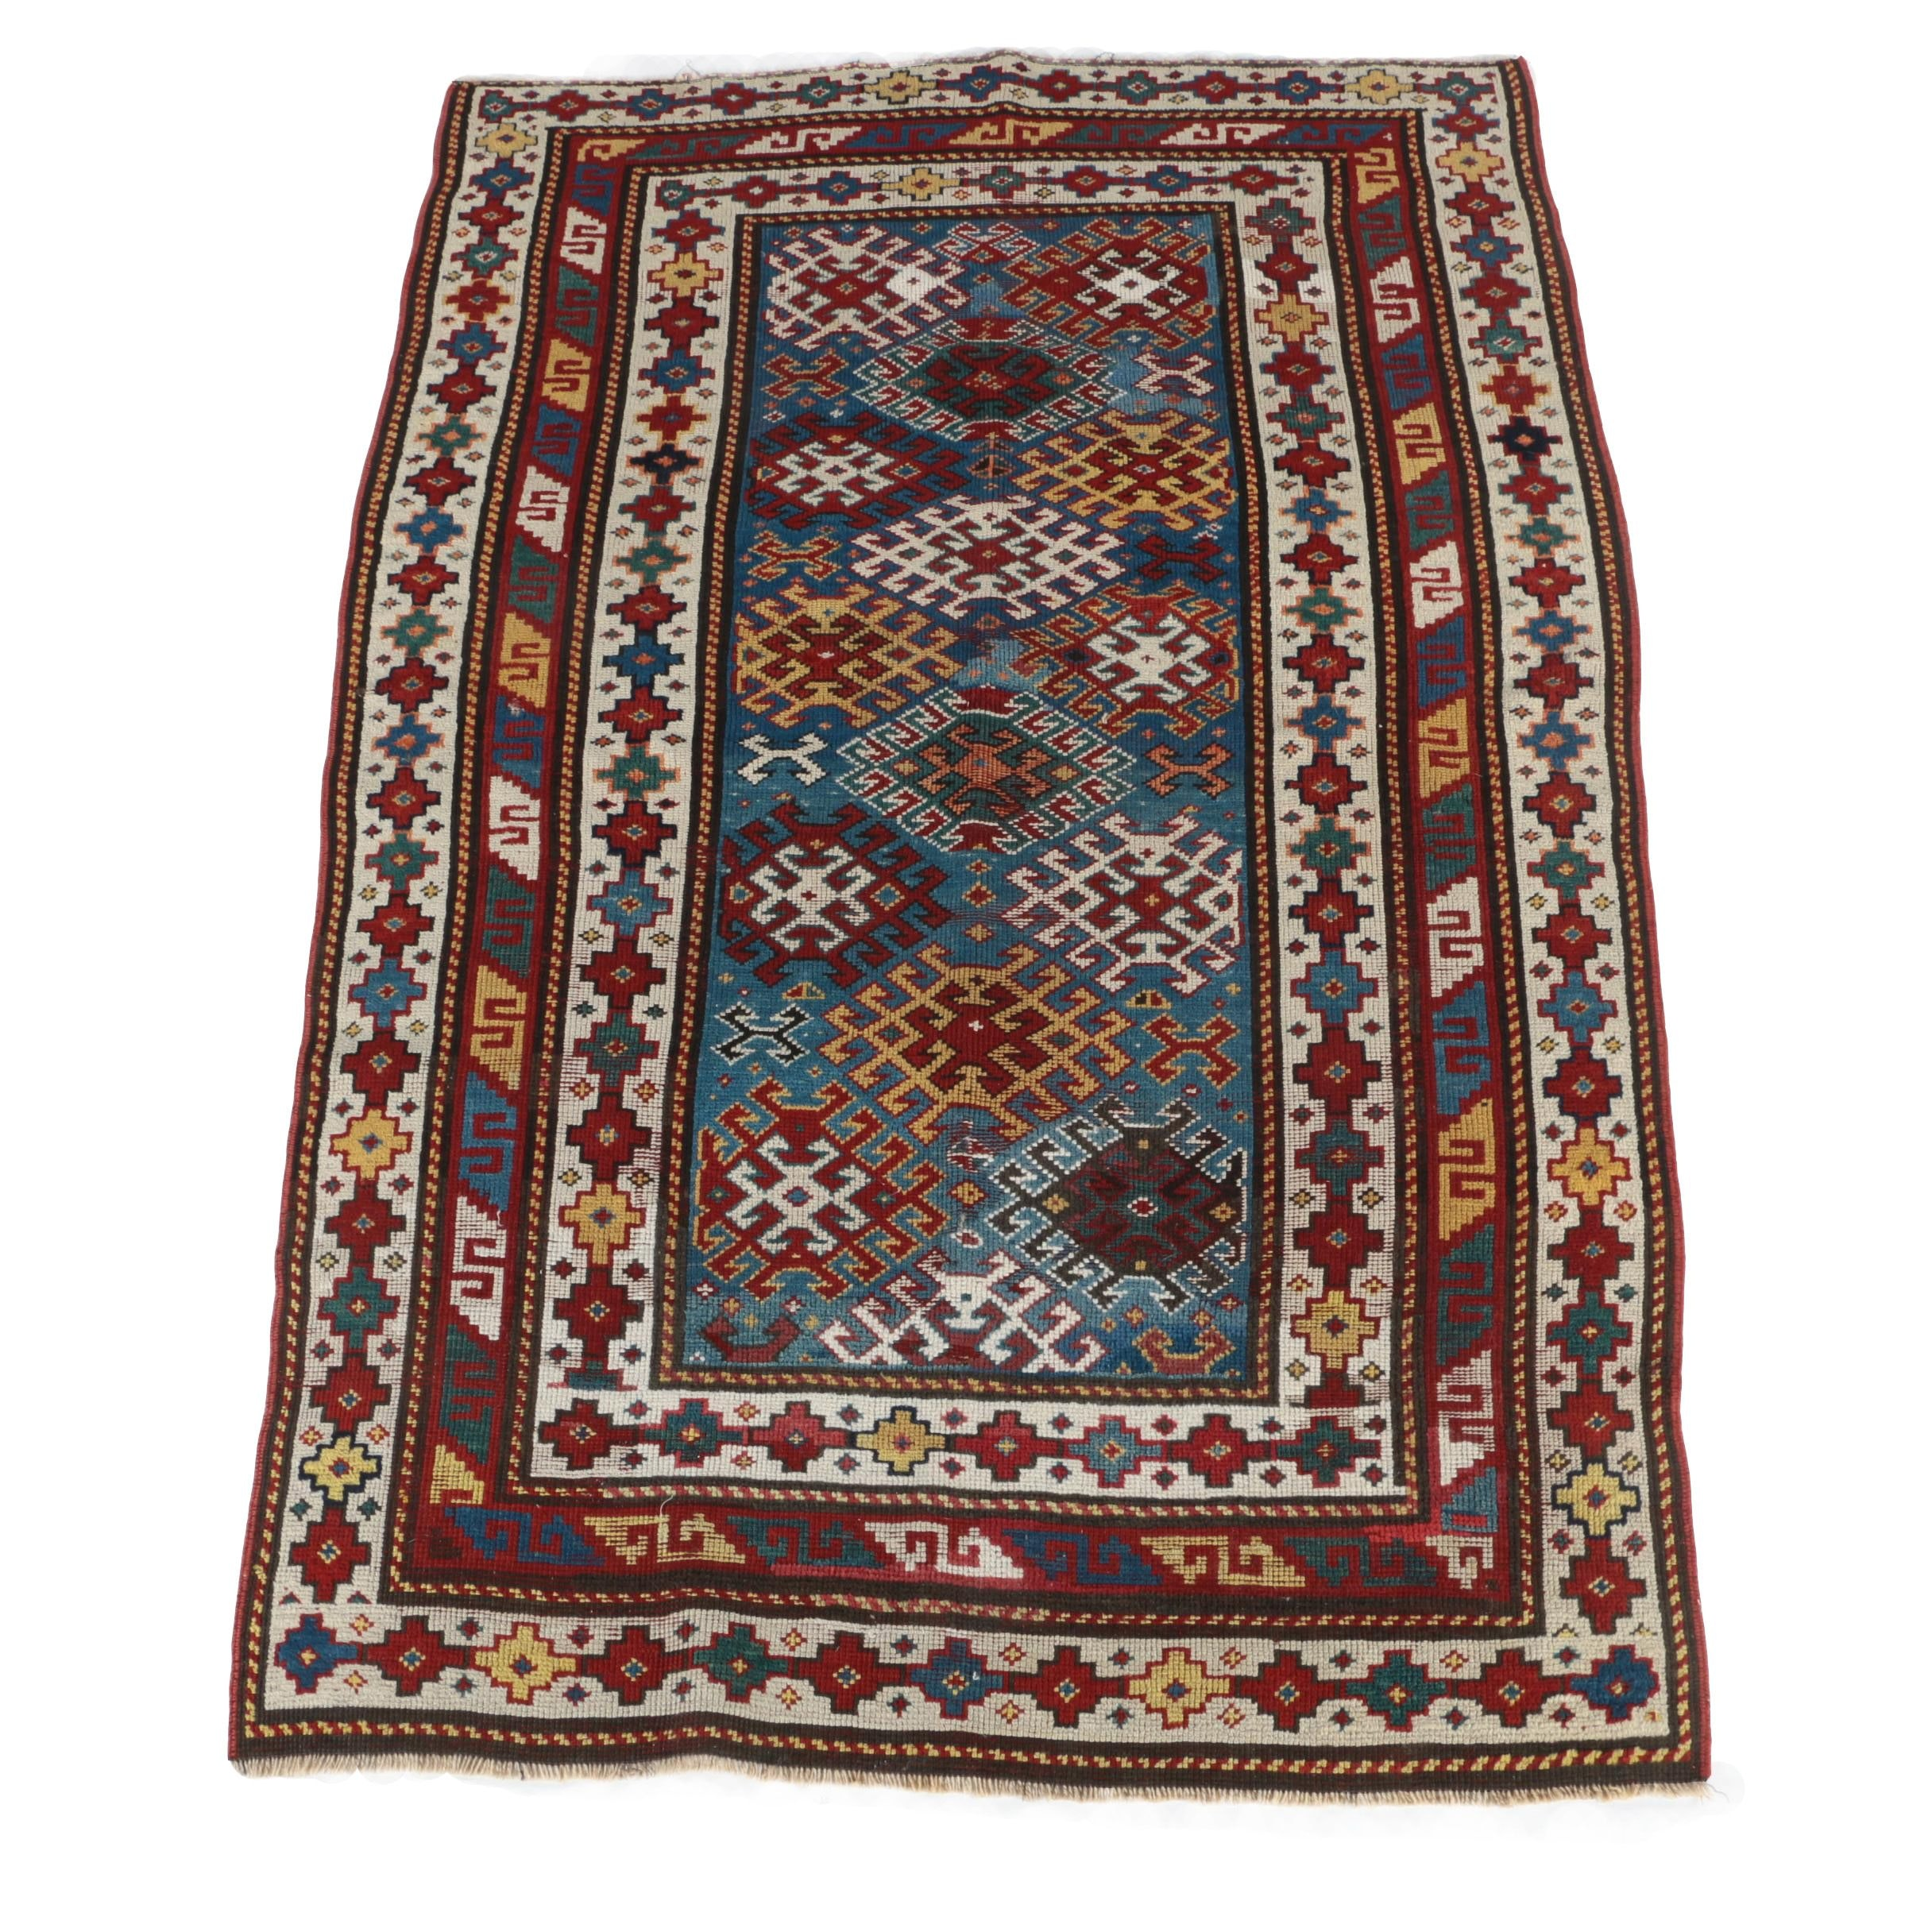 Hand-Knotted Kazak Area Rug